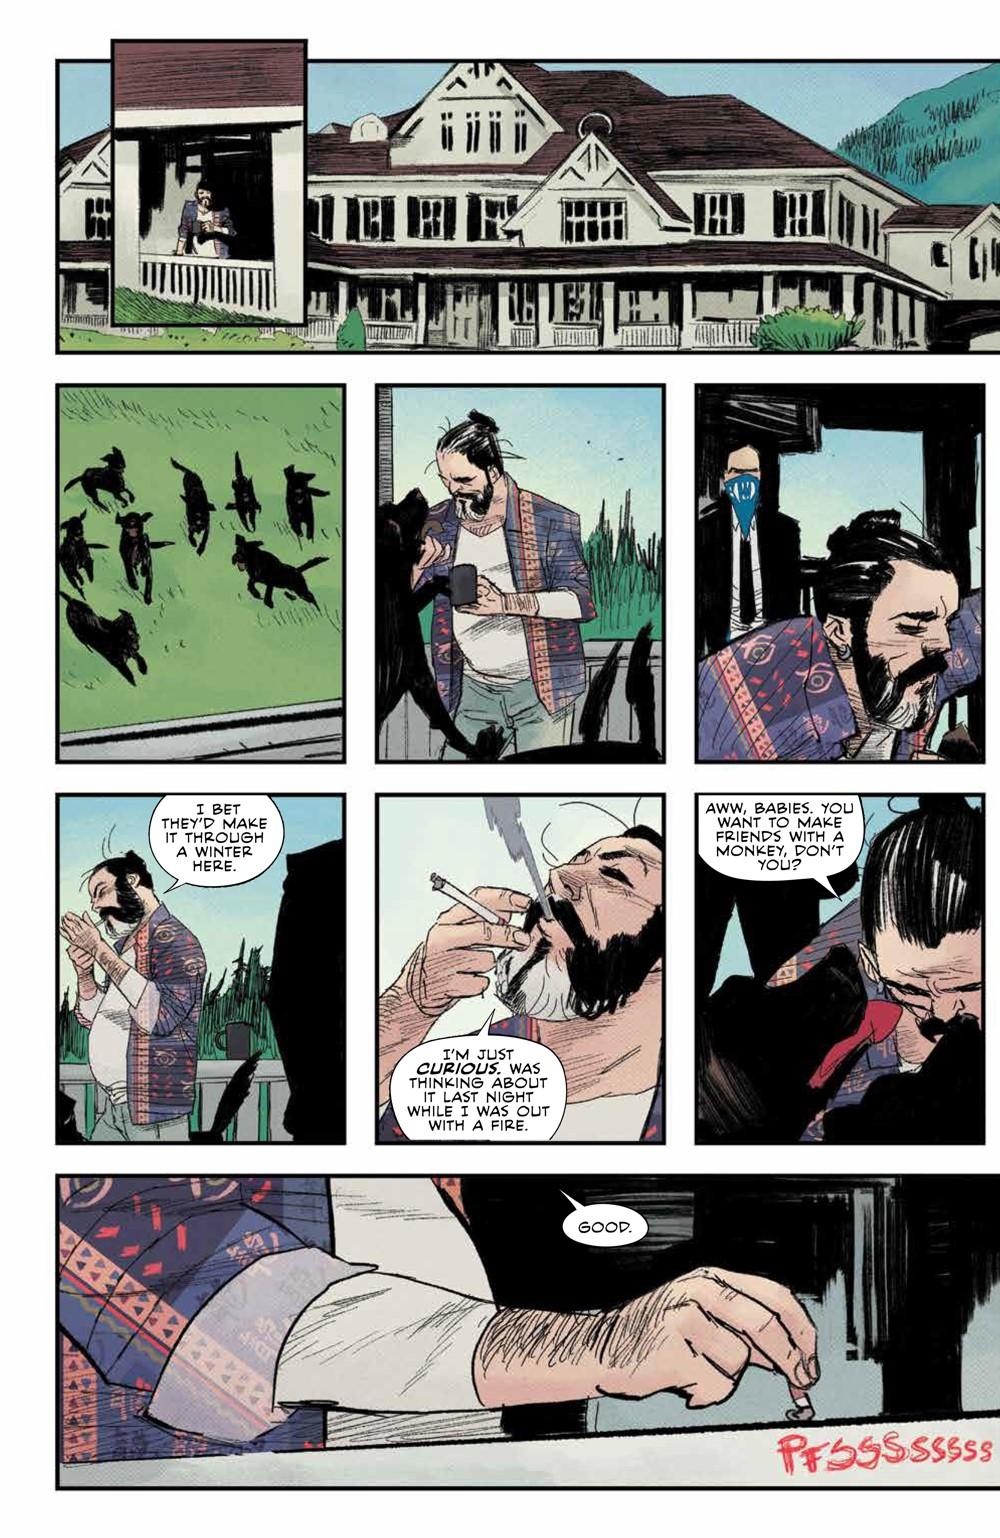 SomethingKillingChildren_018_PRESS_6 ComicList Previews: SOMETHING IS KILLING THE CHILDREN #18